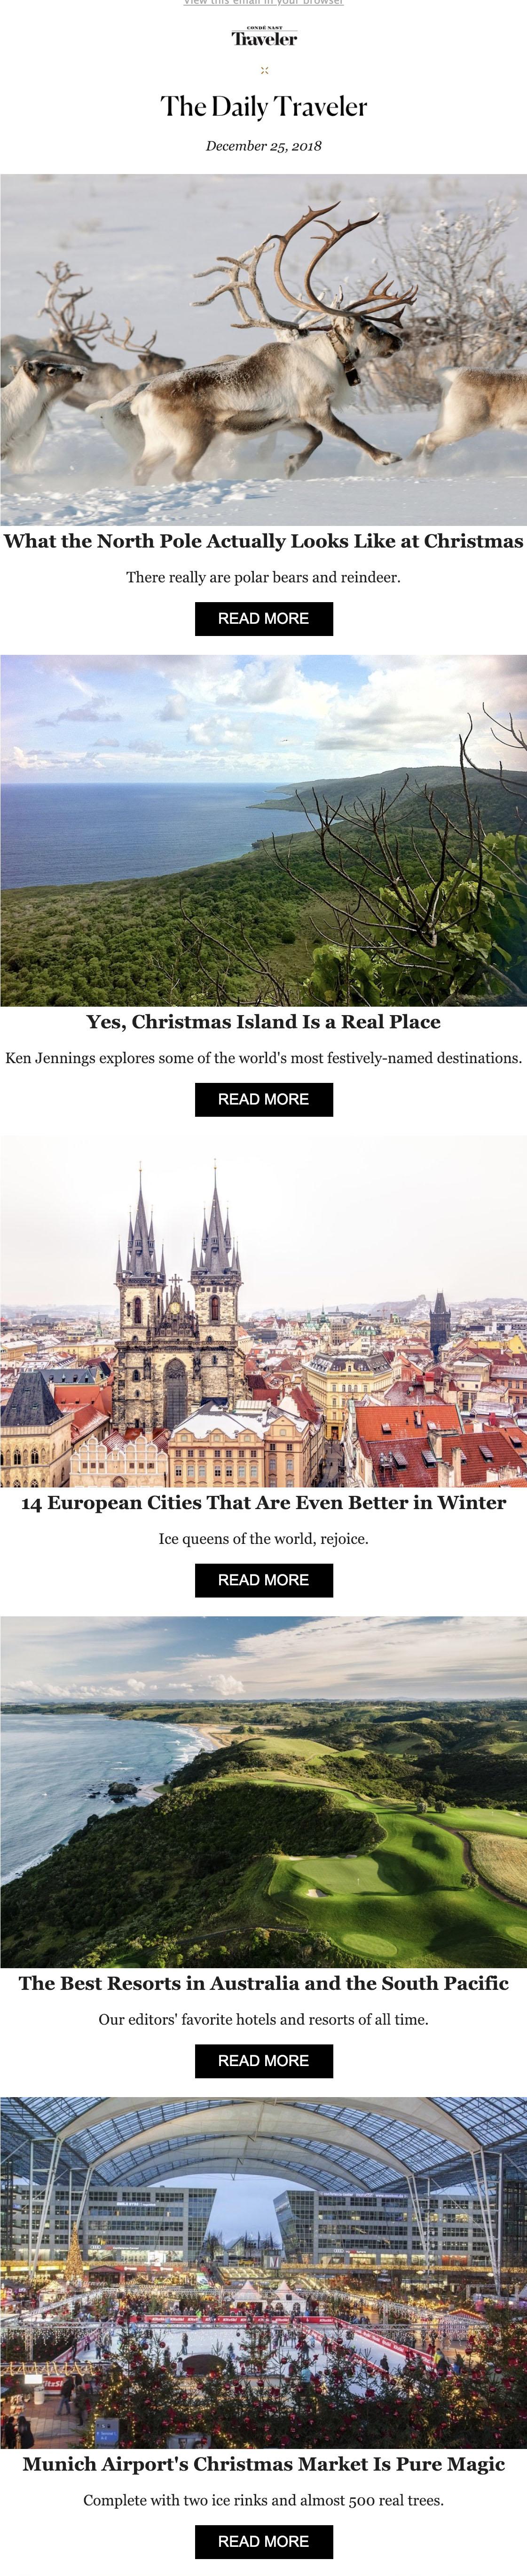 conde nast turismo